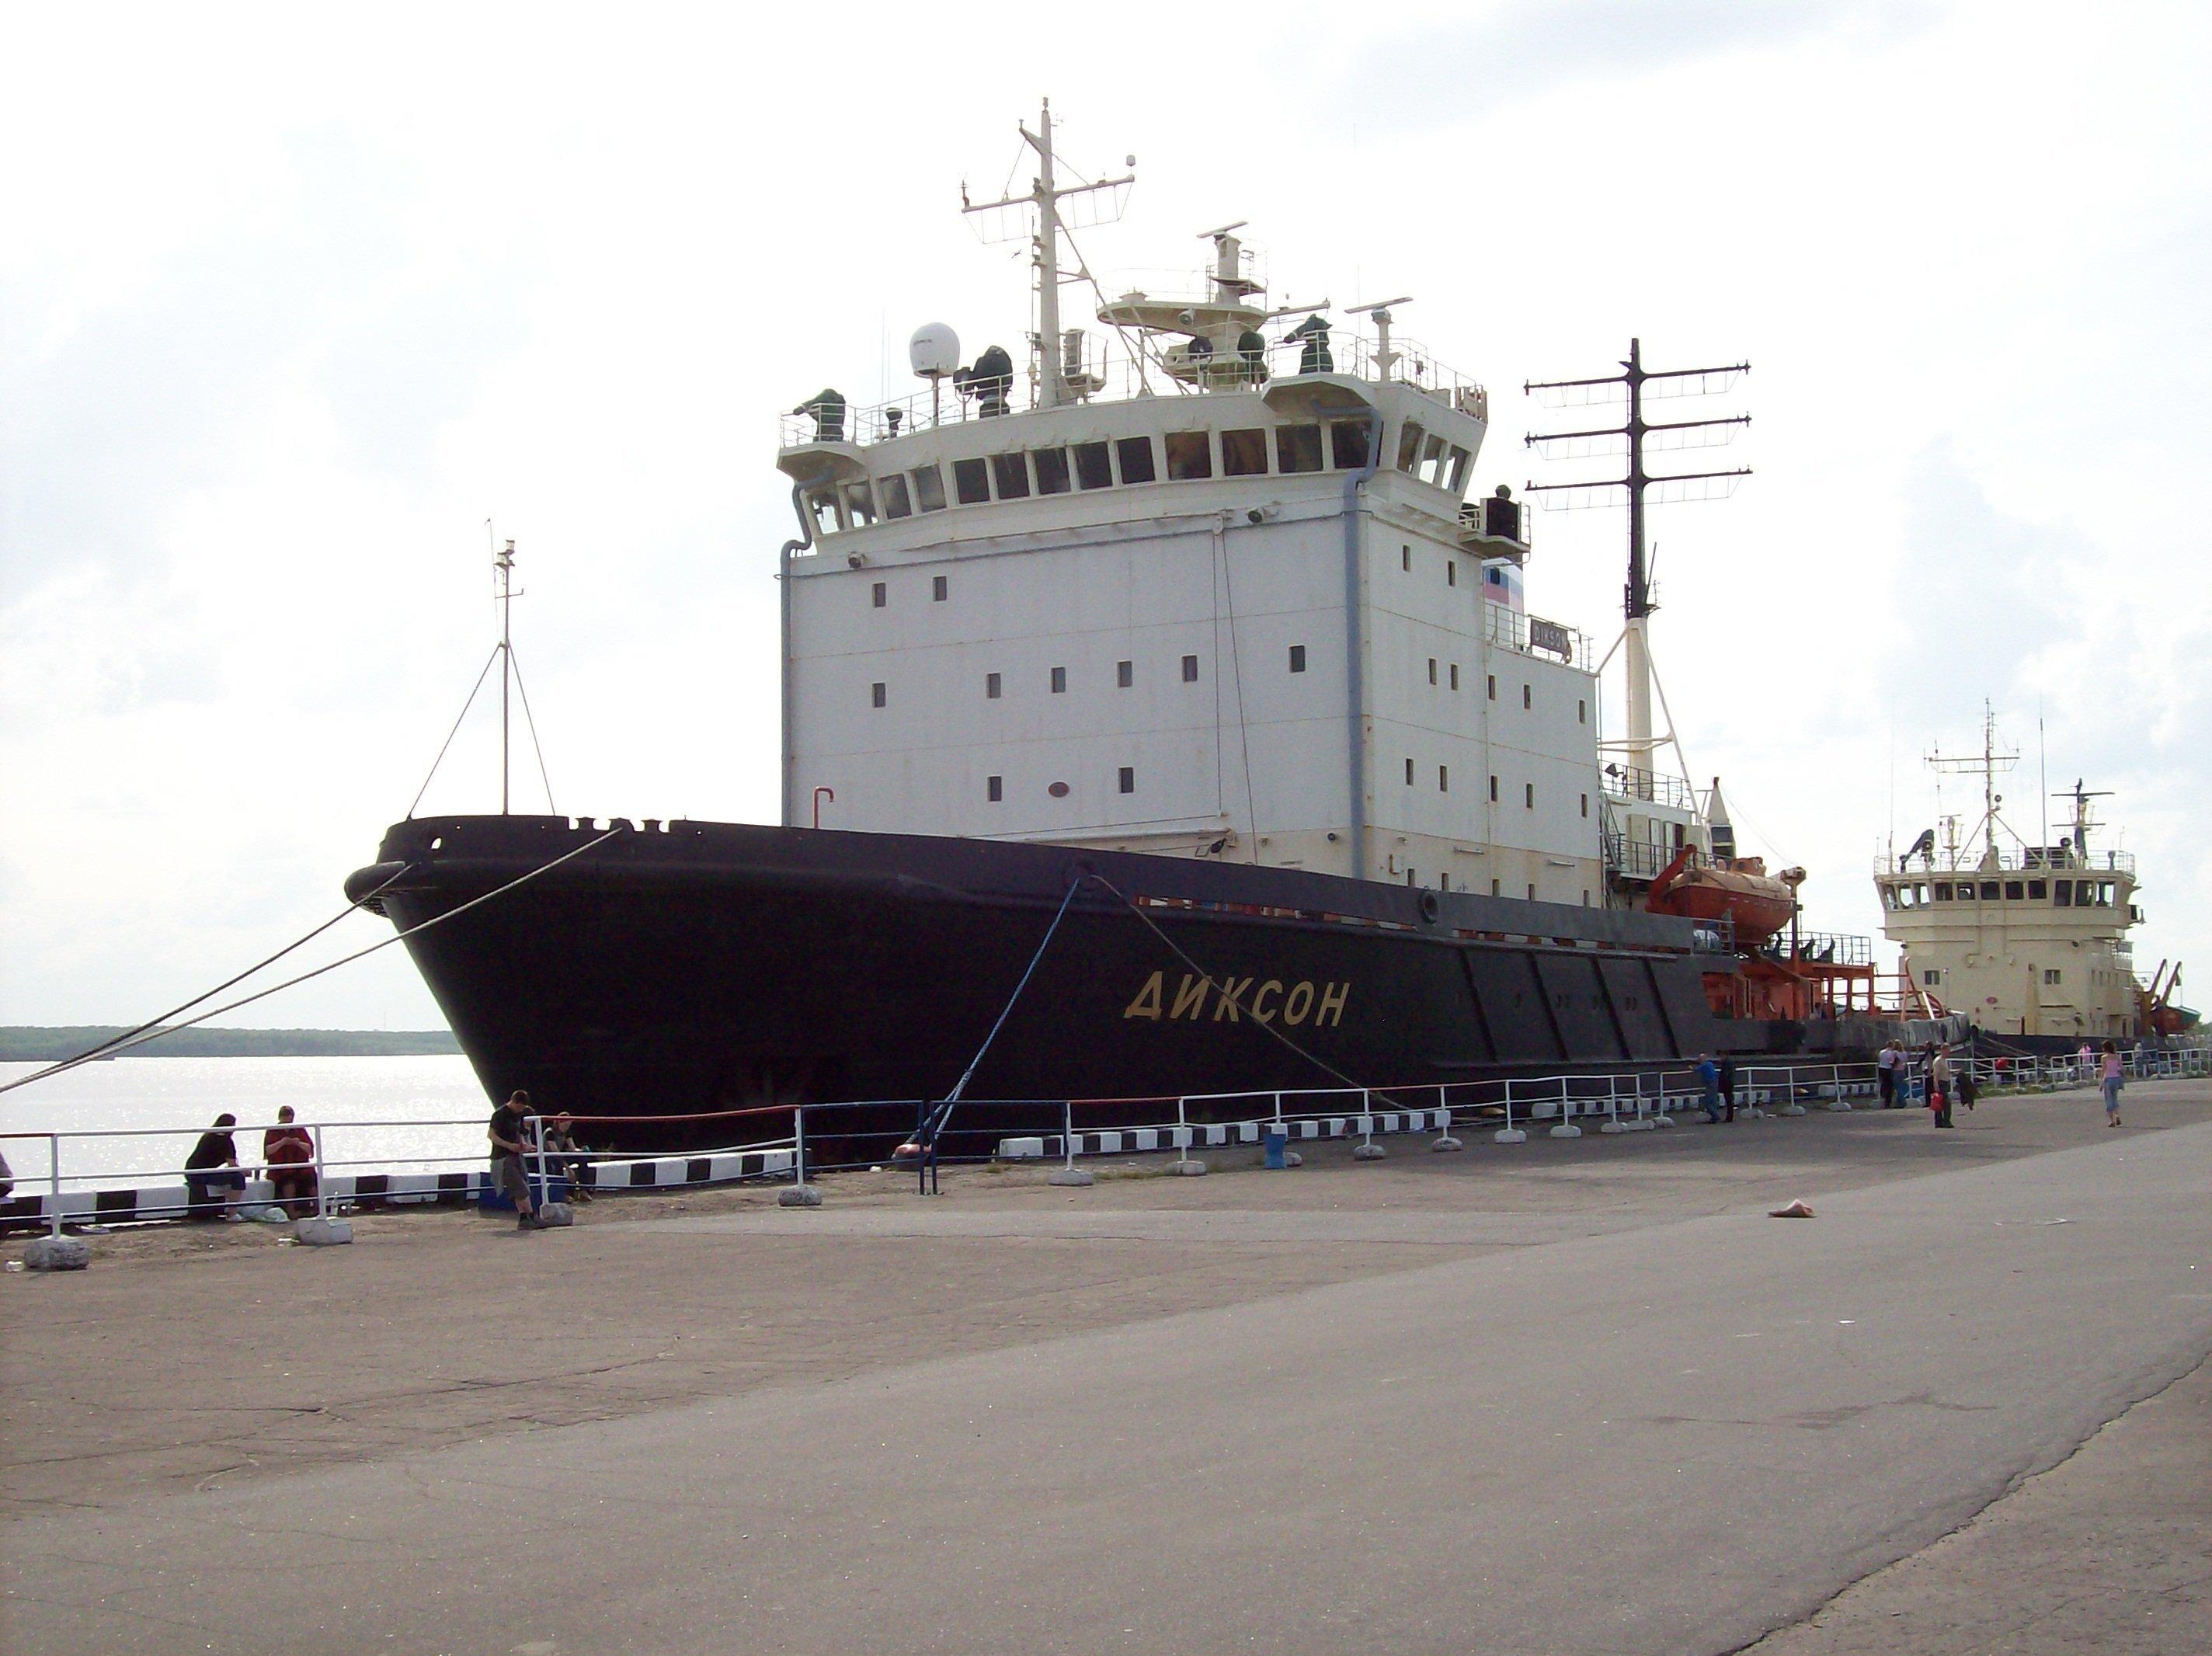 The Dixon diesel icebreaker